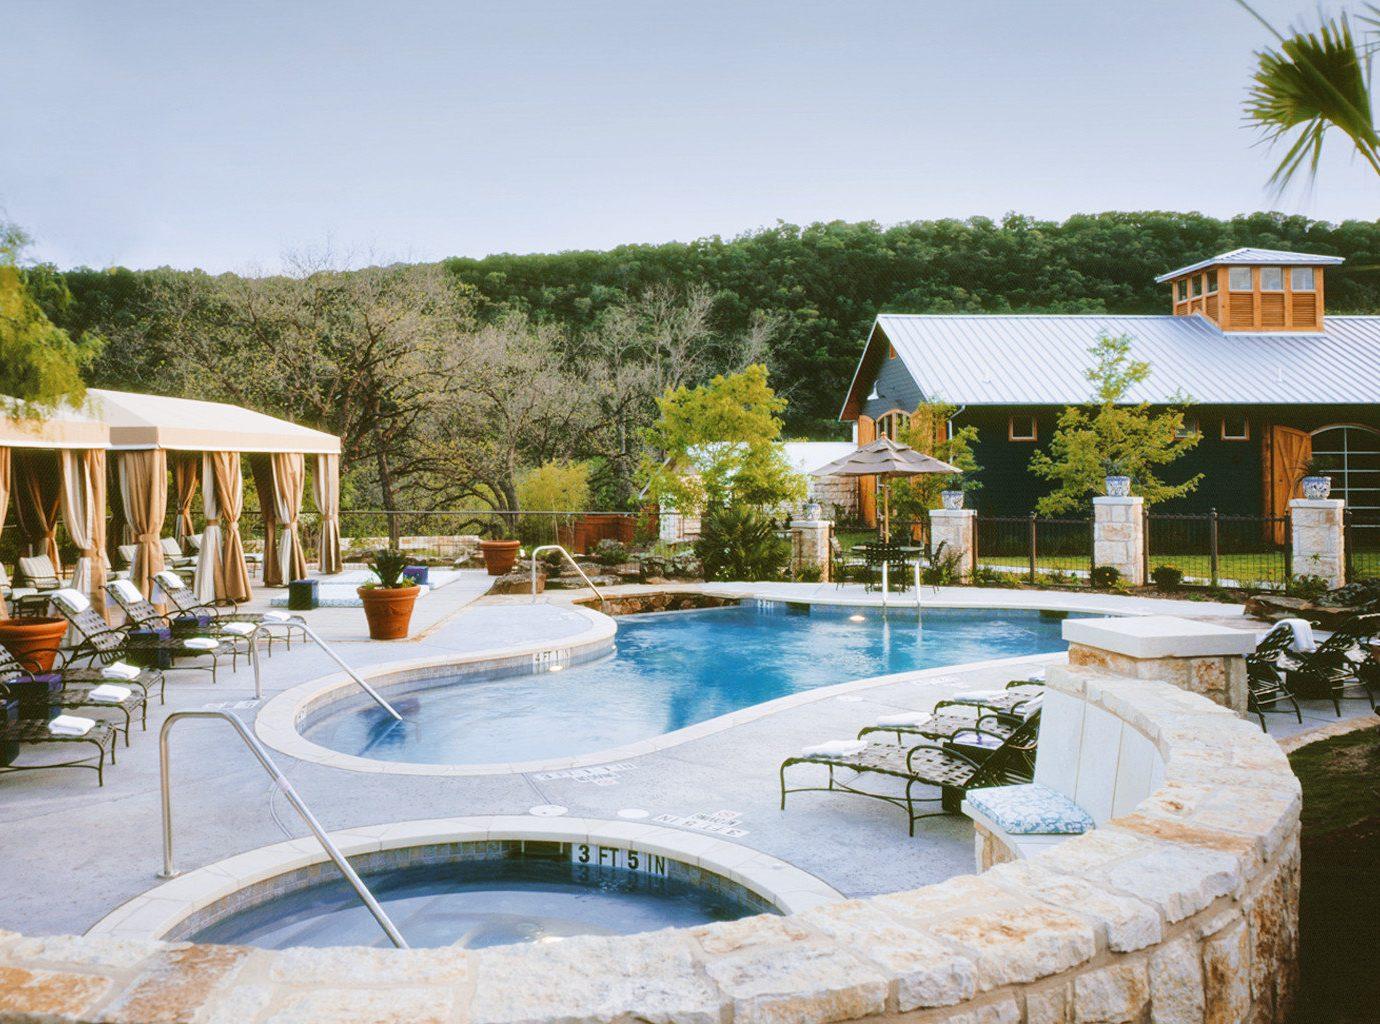 Trip Ideas tree outdoor sky swimming pool property leisure estate Resort vacation Villa backyard home real estate mansion